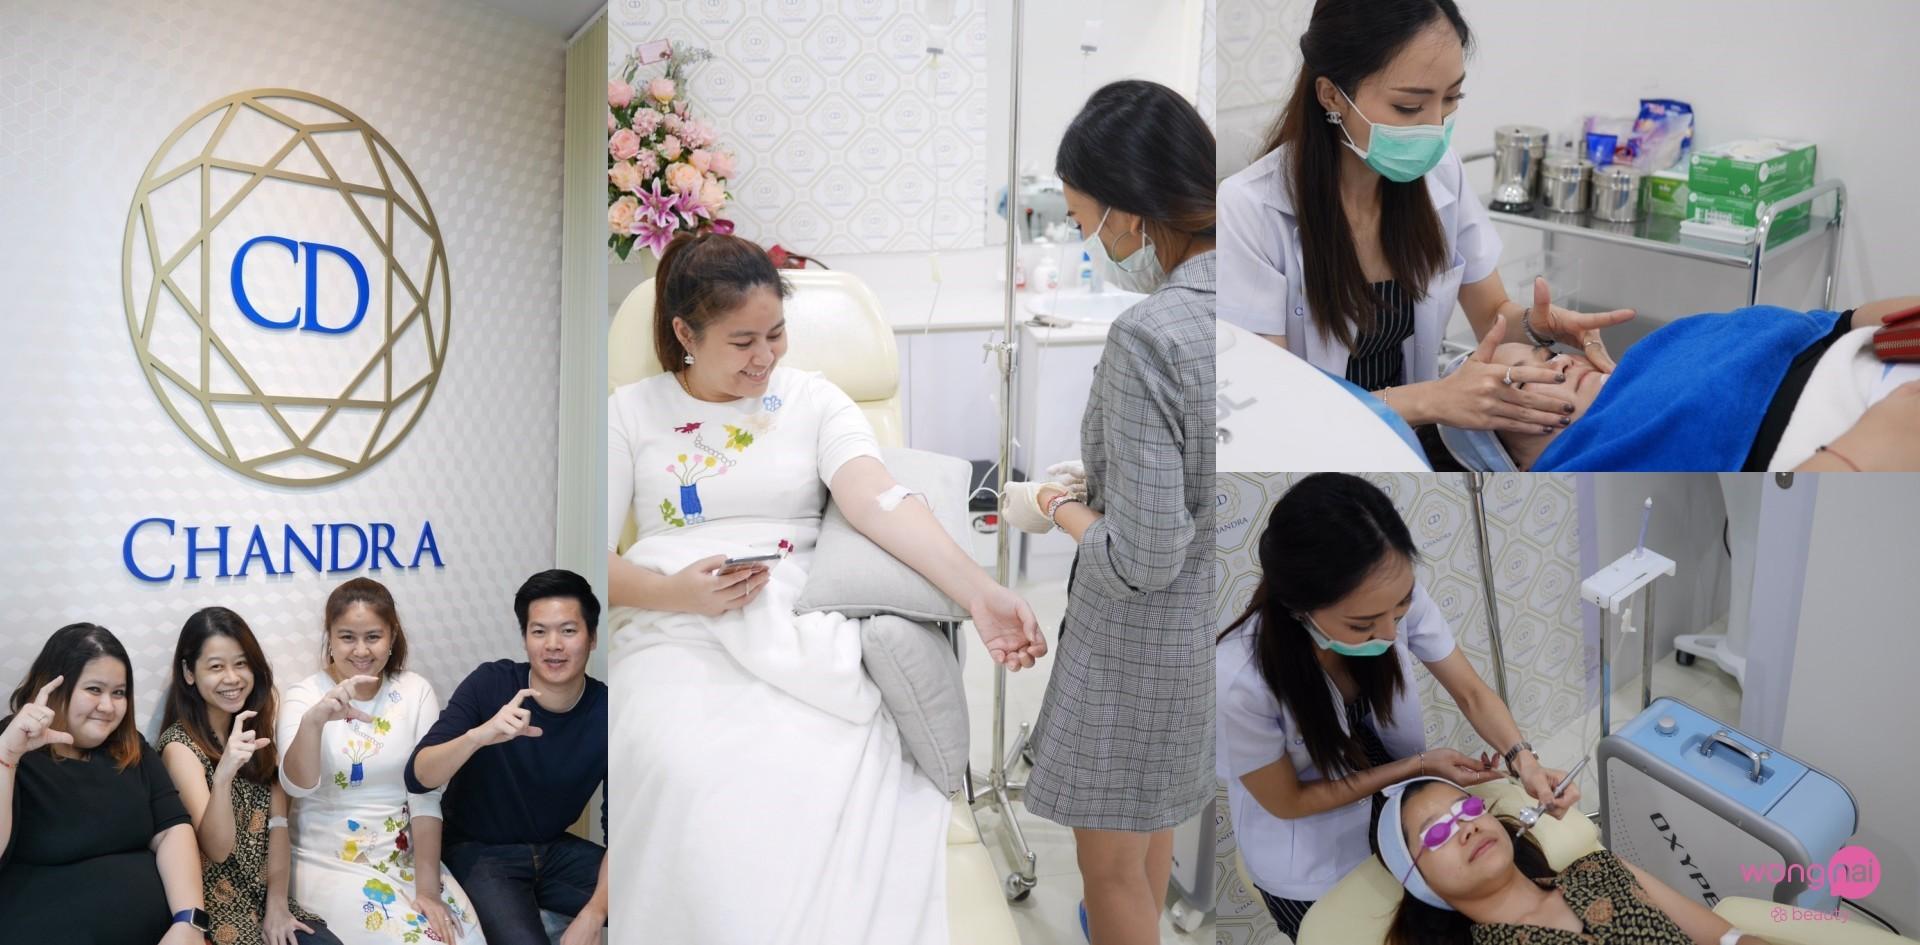 Wongnai Beauty Party x CHANDRA Beauty Care (จันทรา บิวตี้ แคร์)